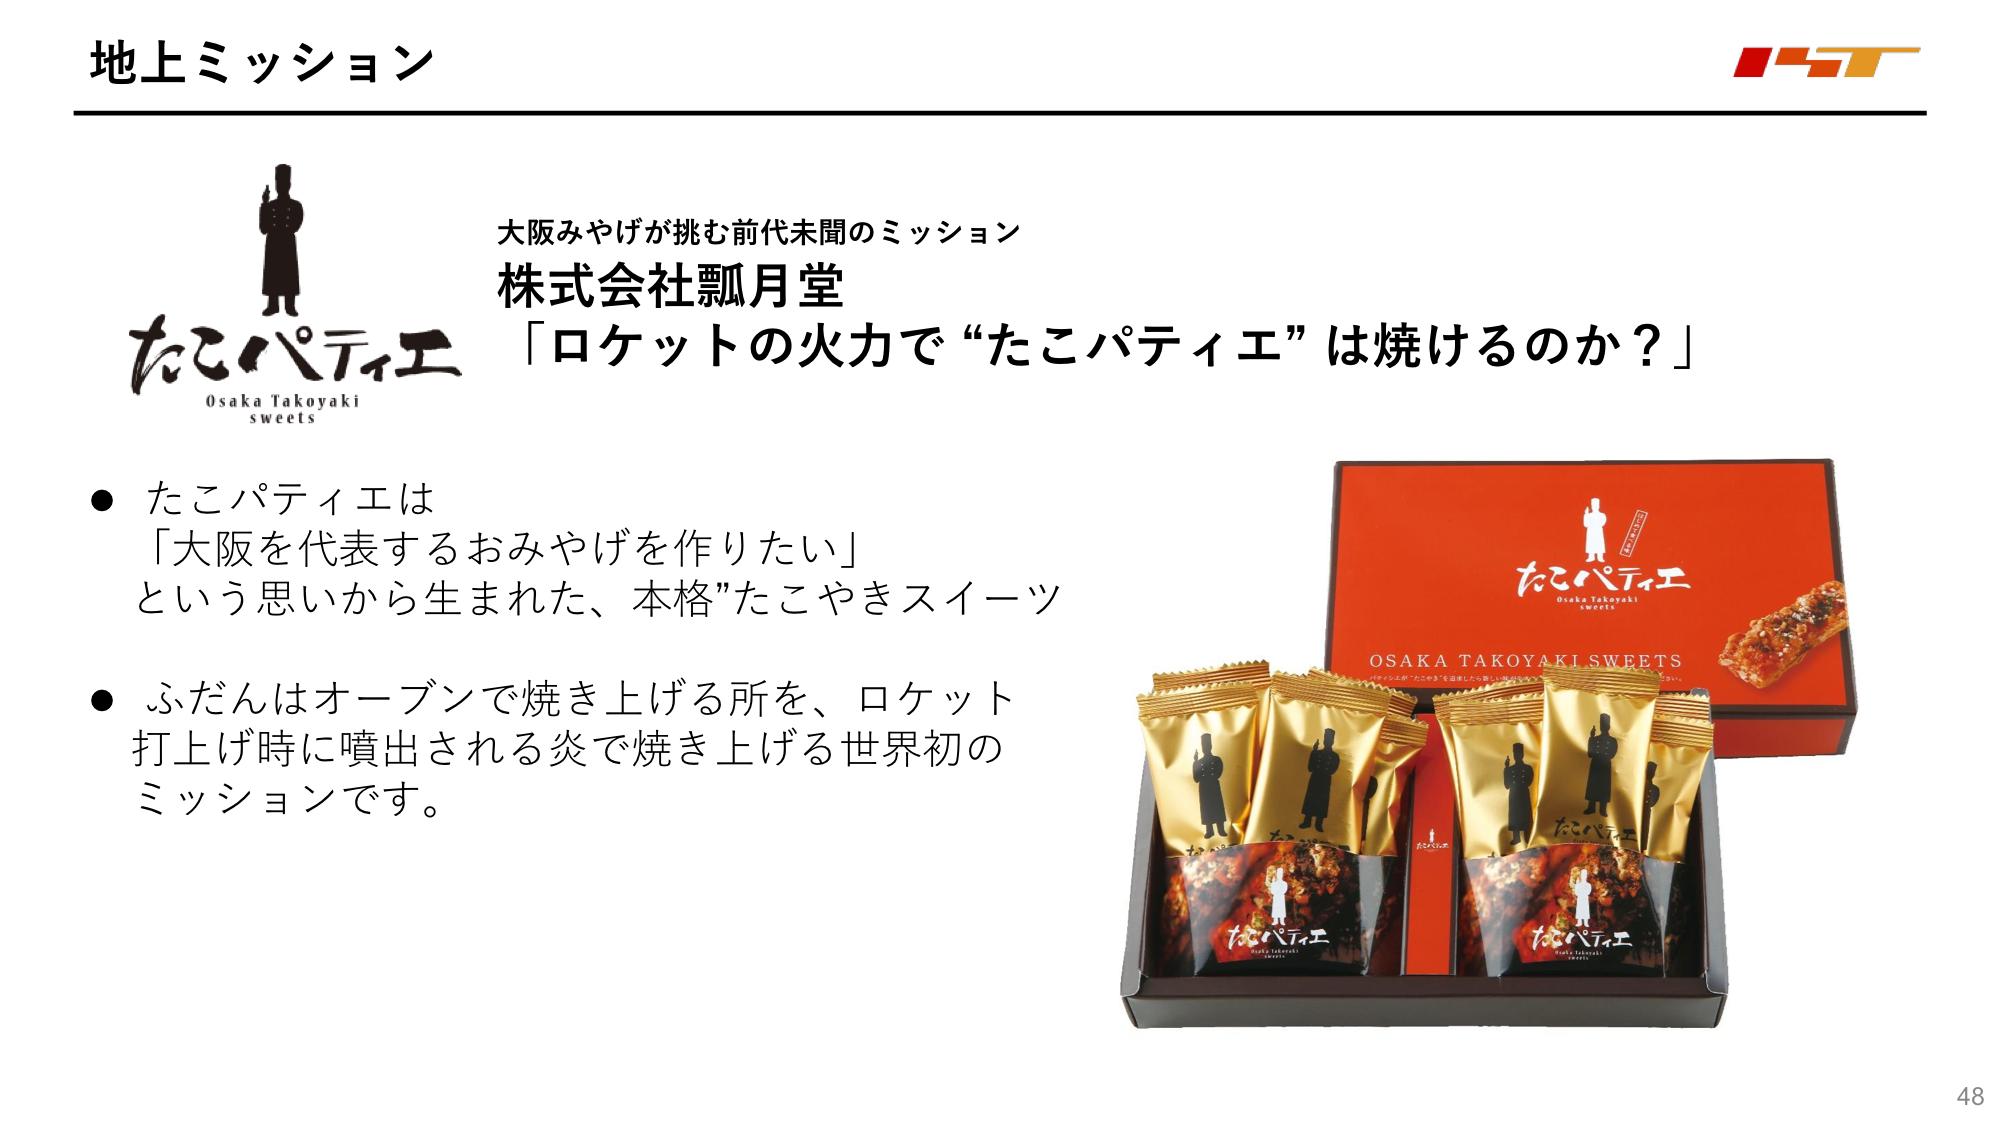 f:id:Imamura:20200603233224p:plain